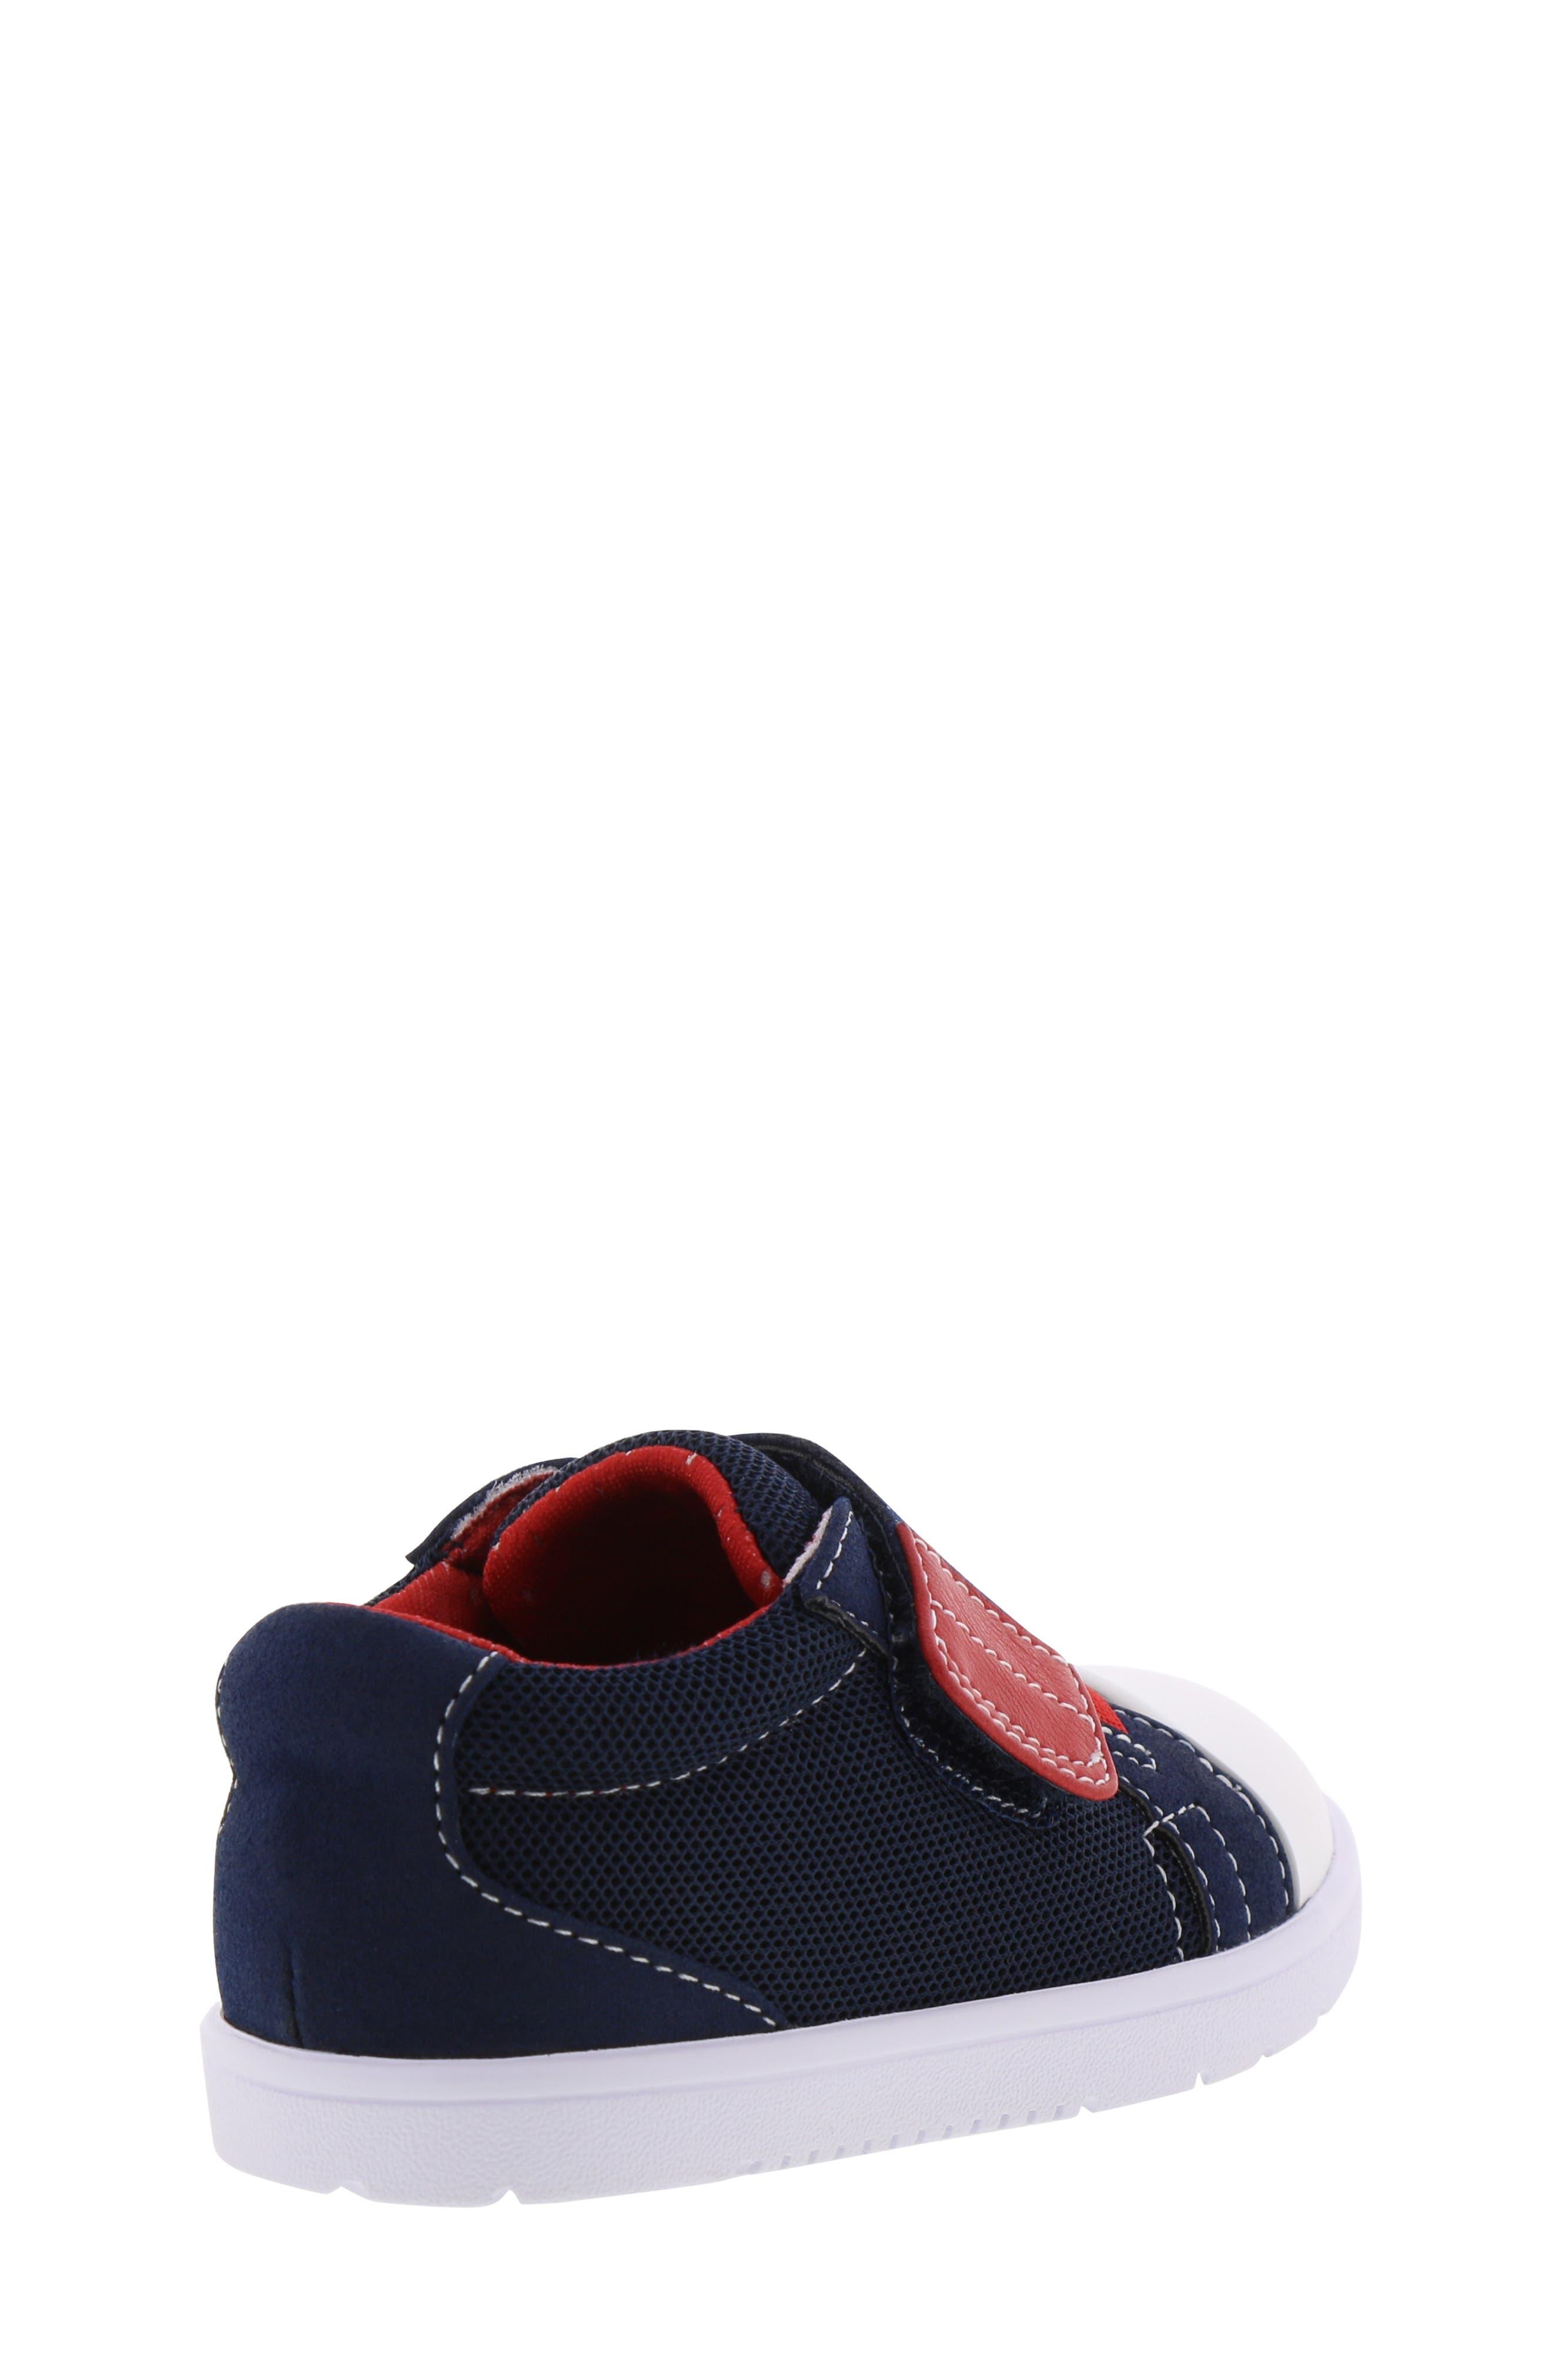 BØRN,                             Bailey Clark Sneaker,                             Alternate thumbnail 2, color,                             NAVY